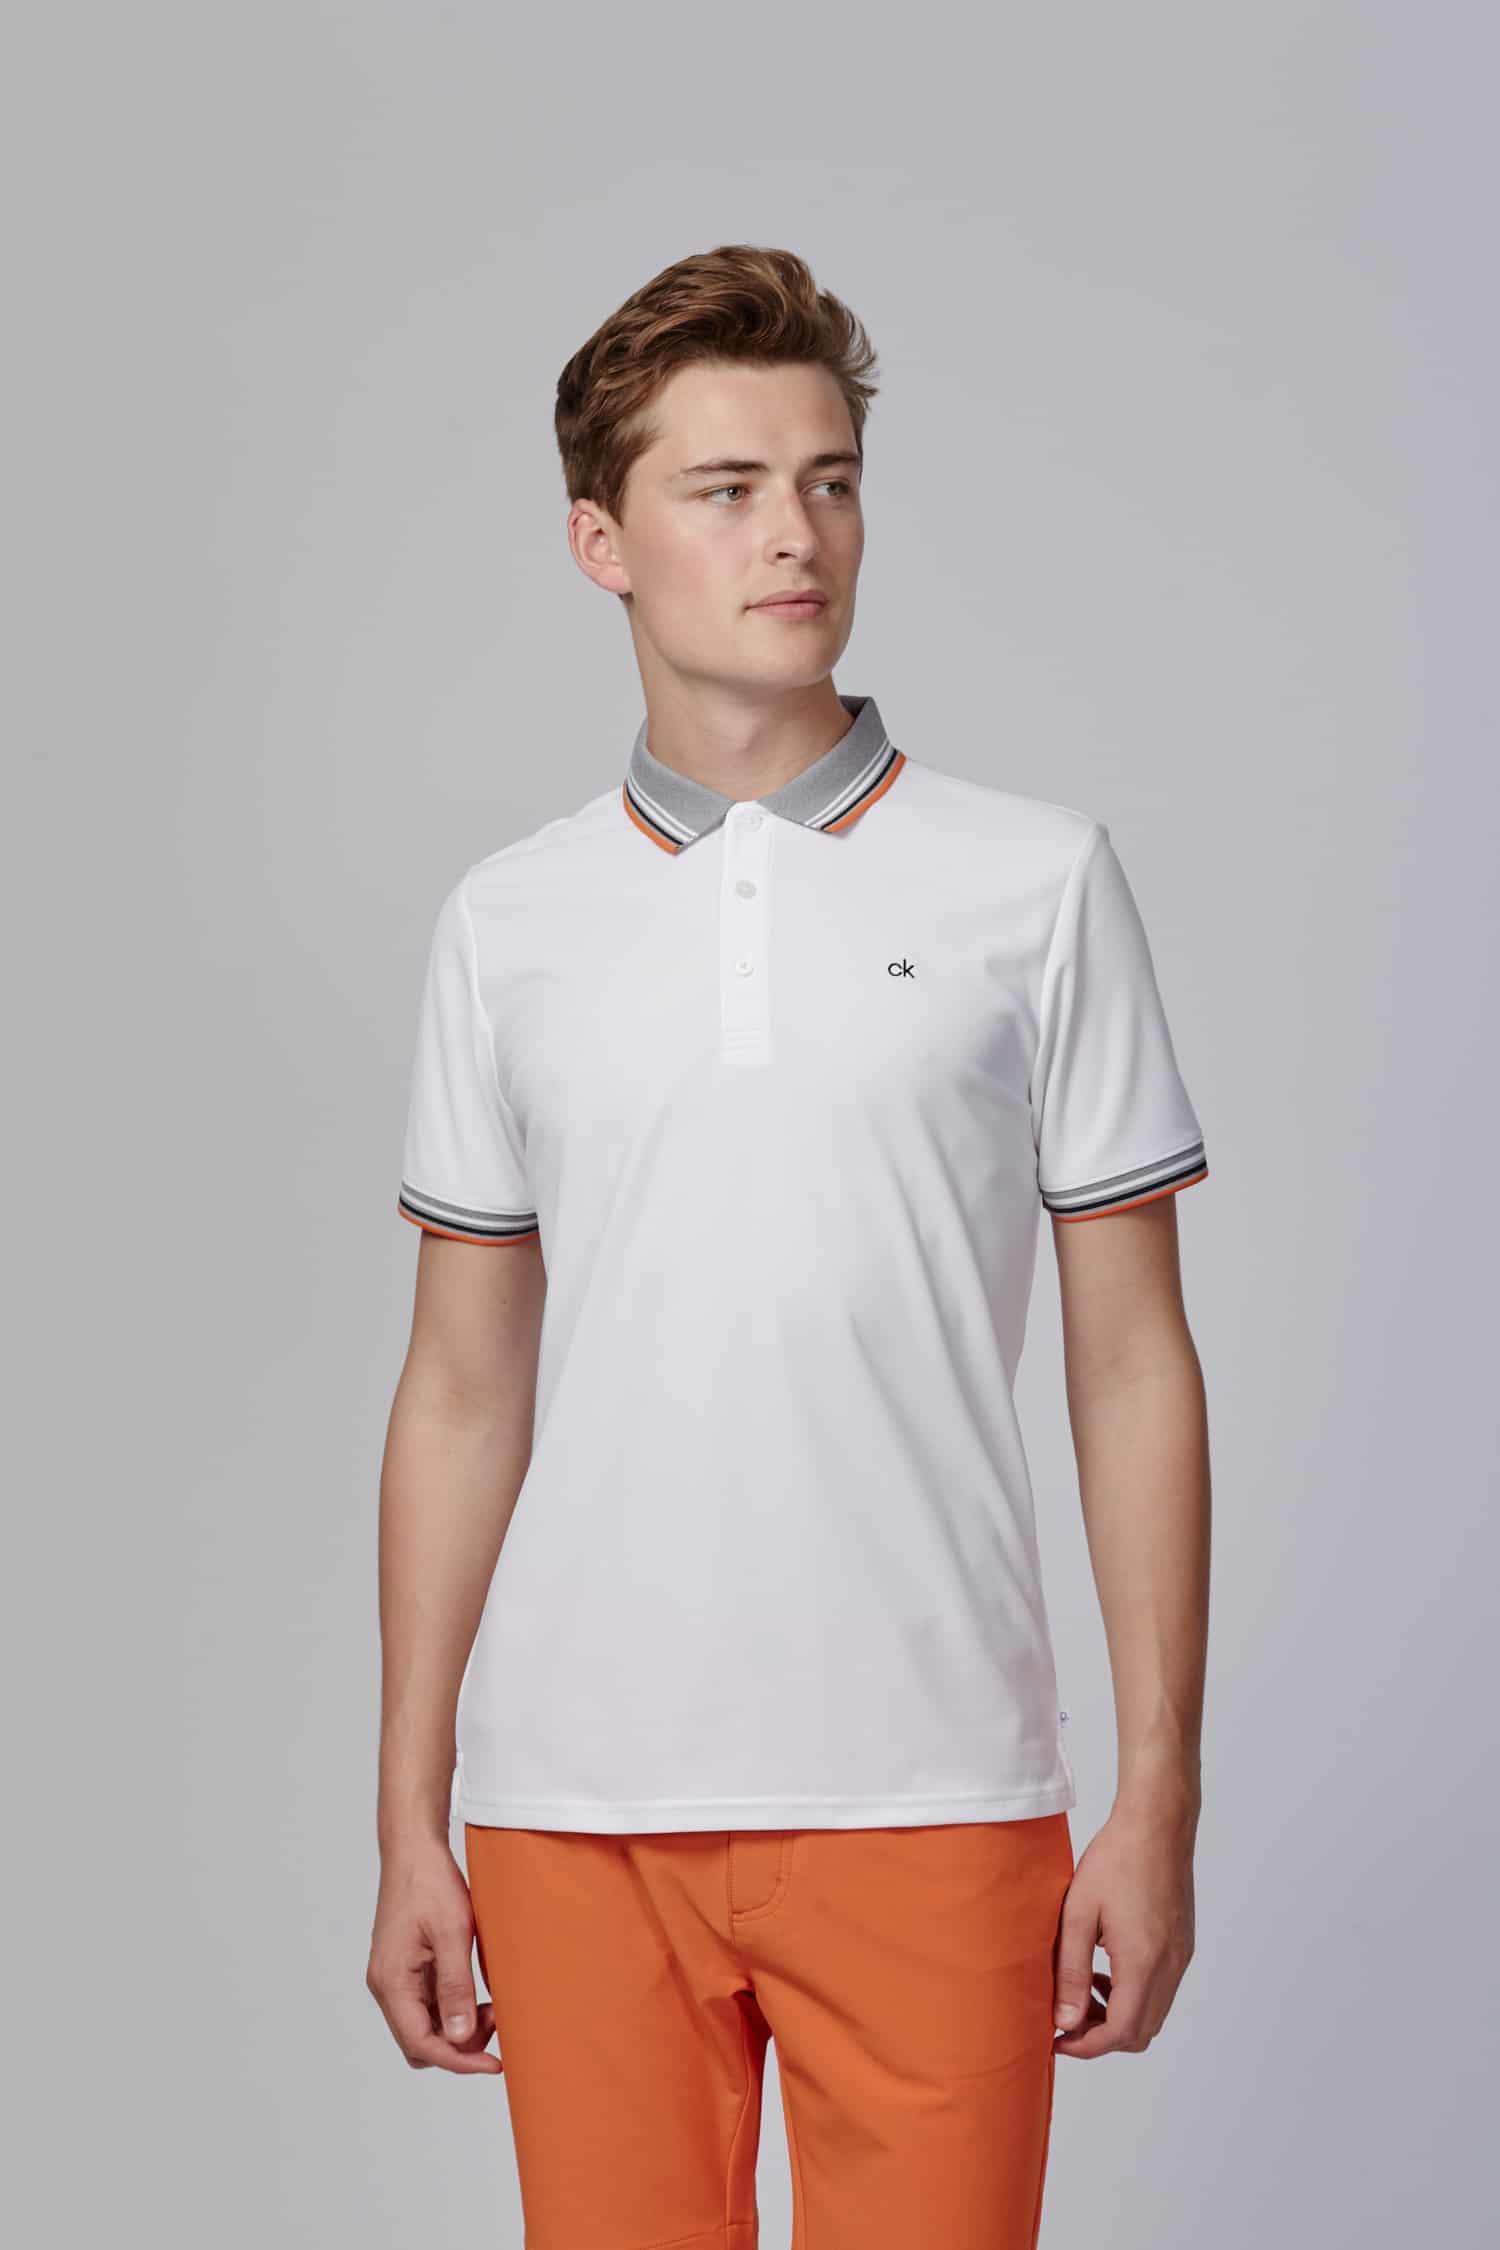 ec5b65738a7f Calvin Klein Bi-Lite Polo white/pure orange CKMS19202 - uwgolfwinkel.nl